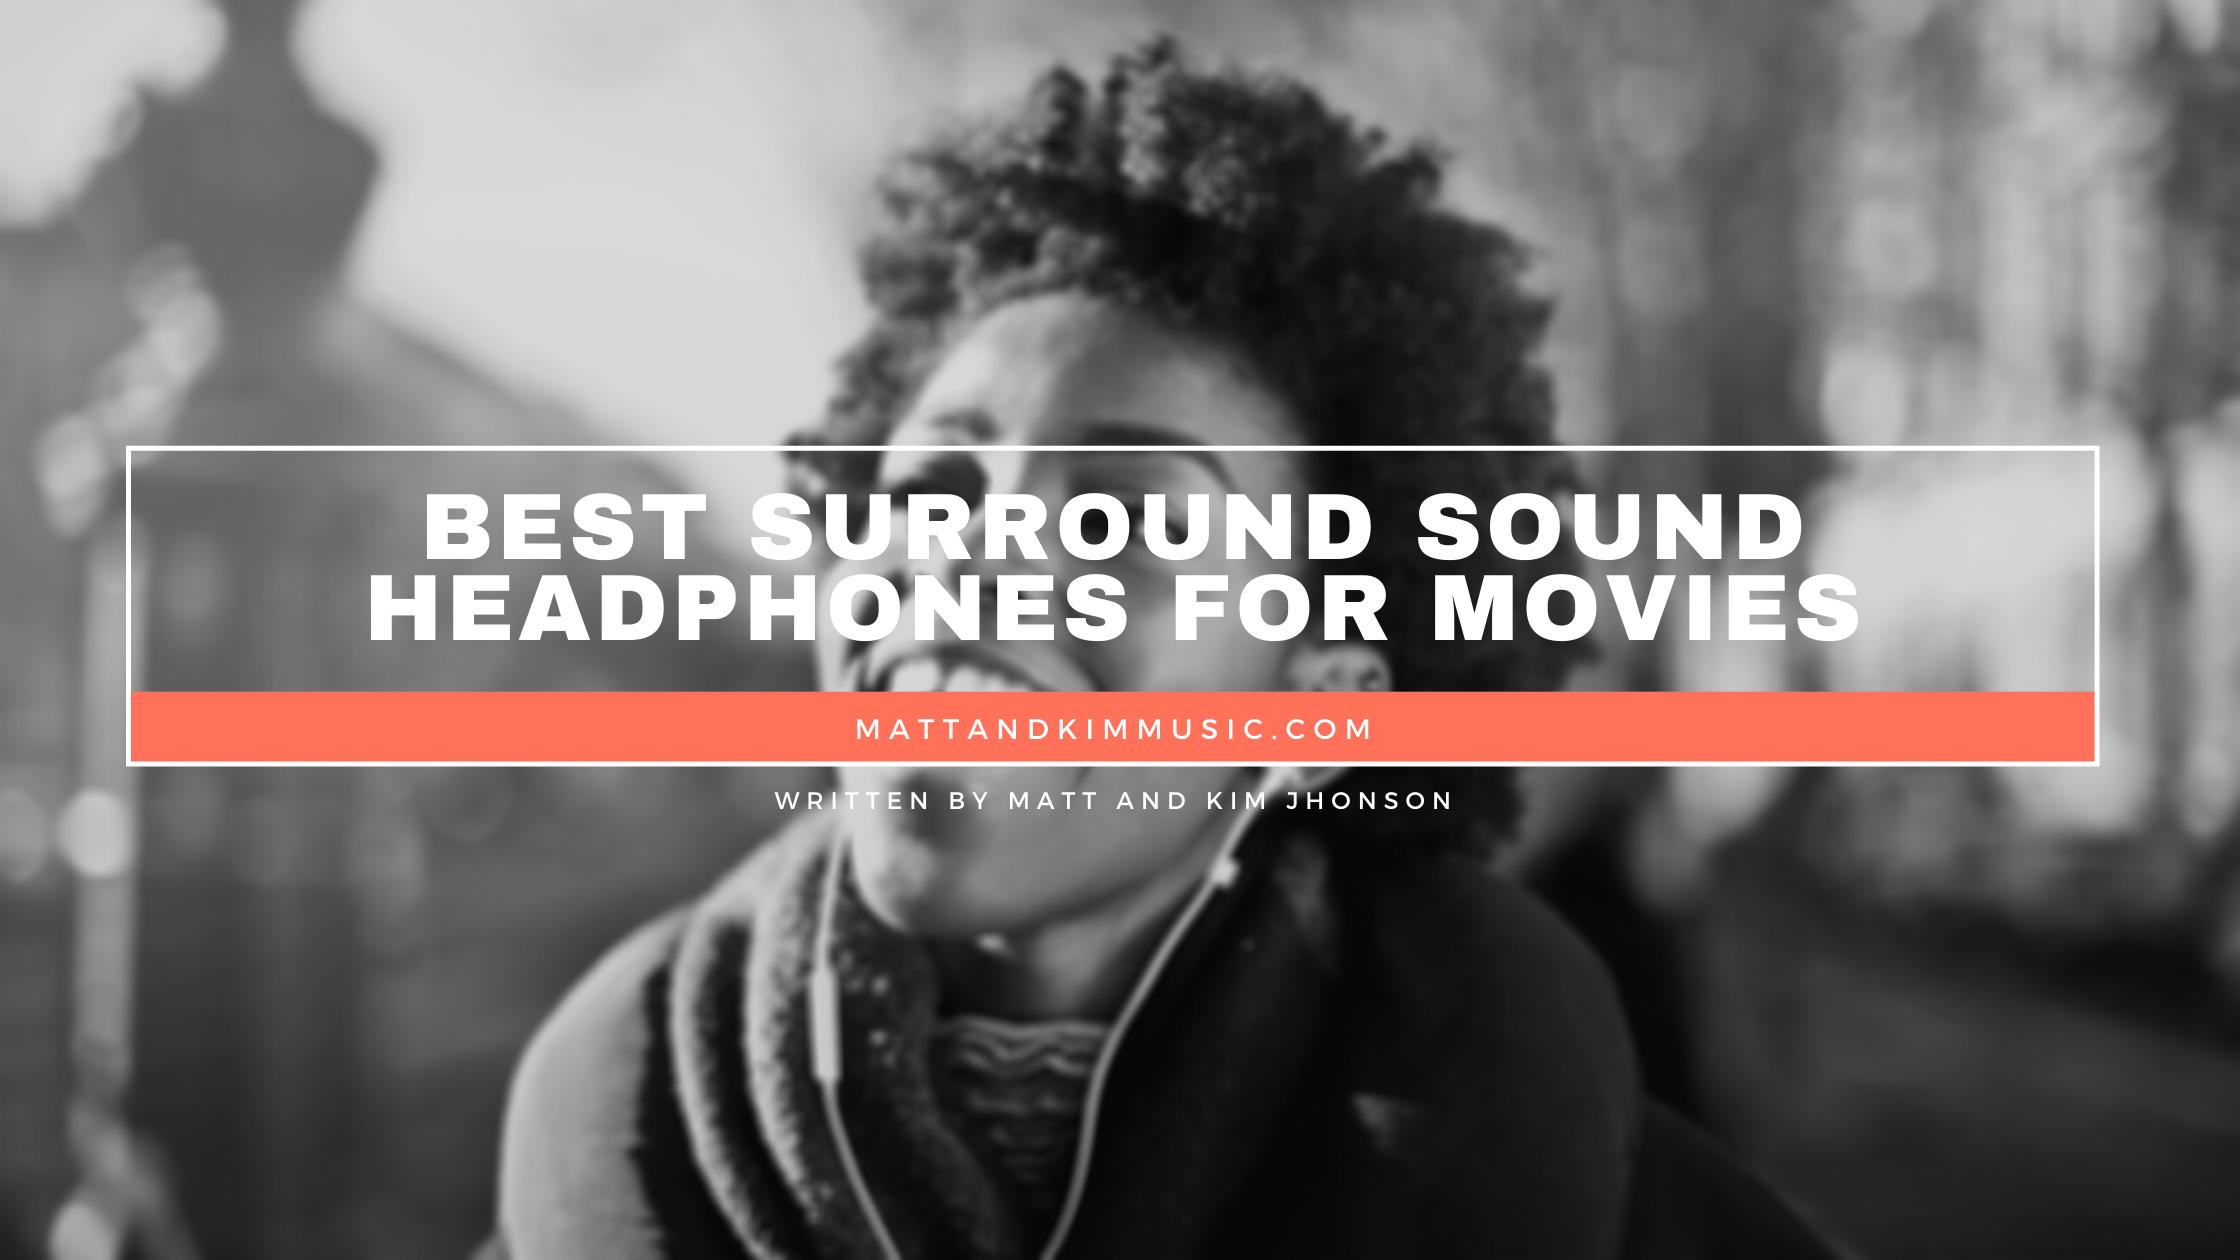 best surround sound headphones for movies